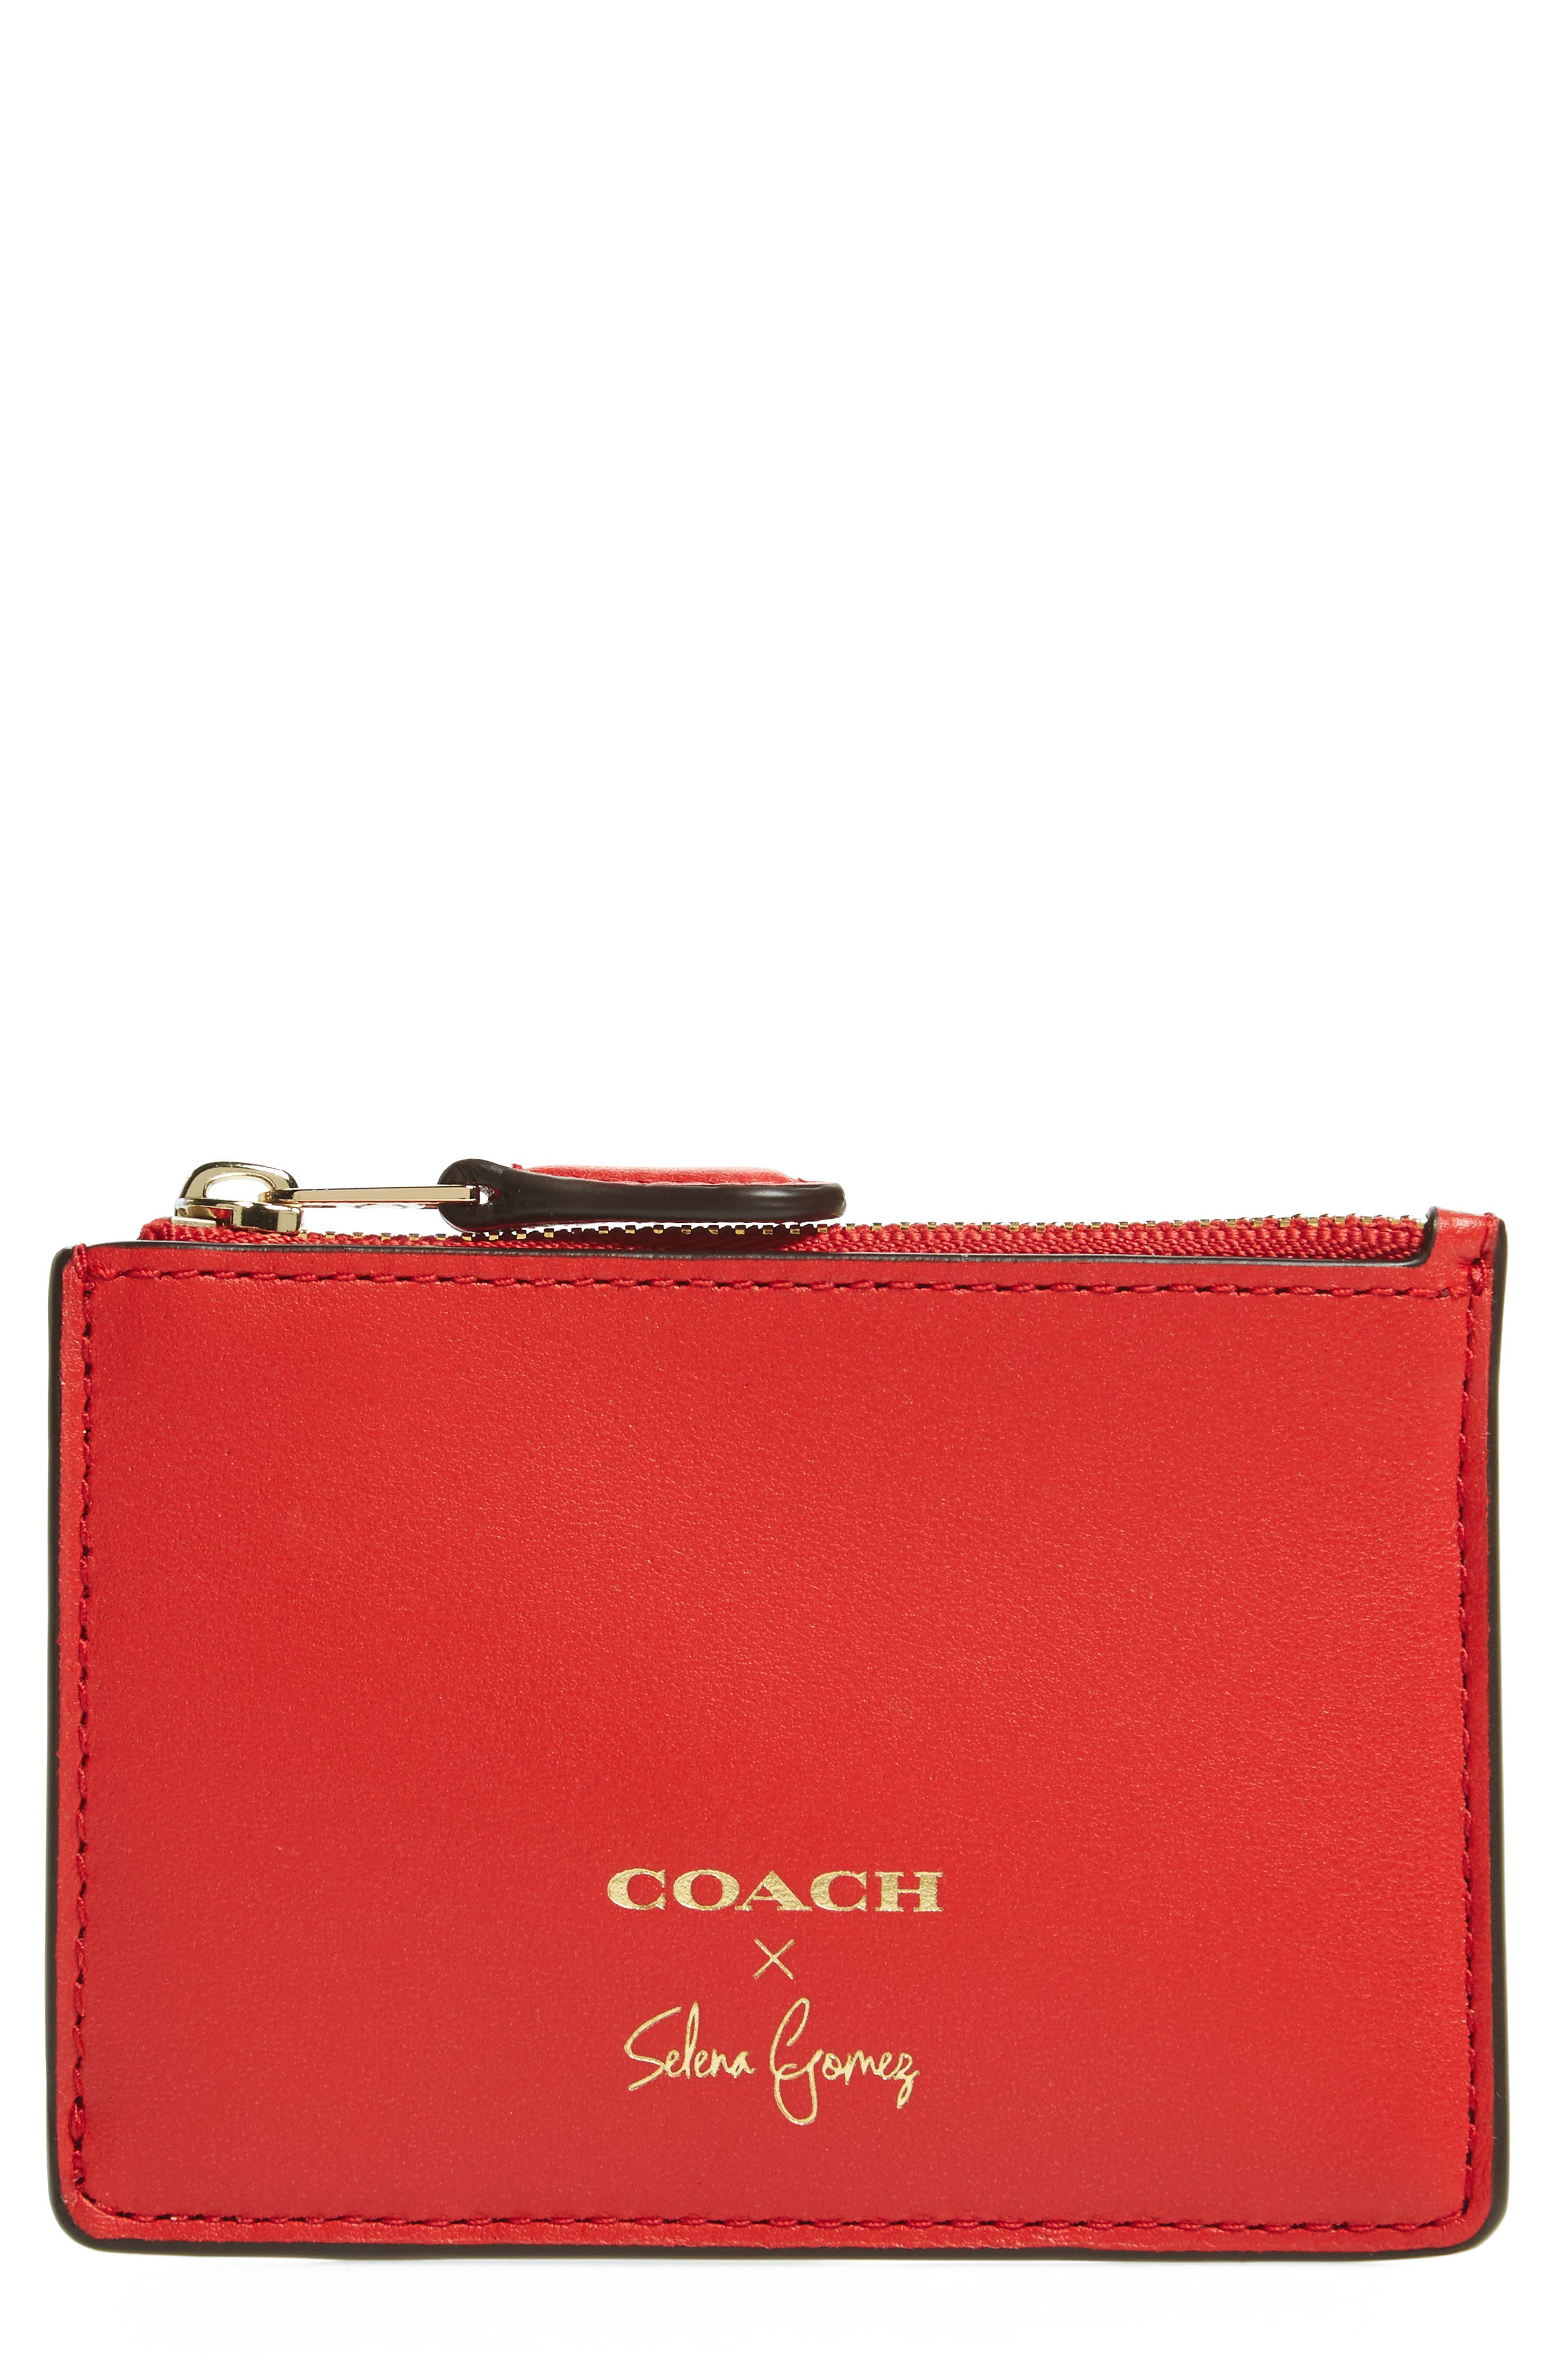 Alternate Image 1 Selected - COACH x Selena Gomez Mini Skinny Leather Card Case